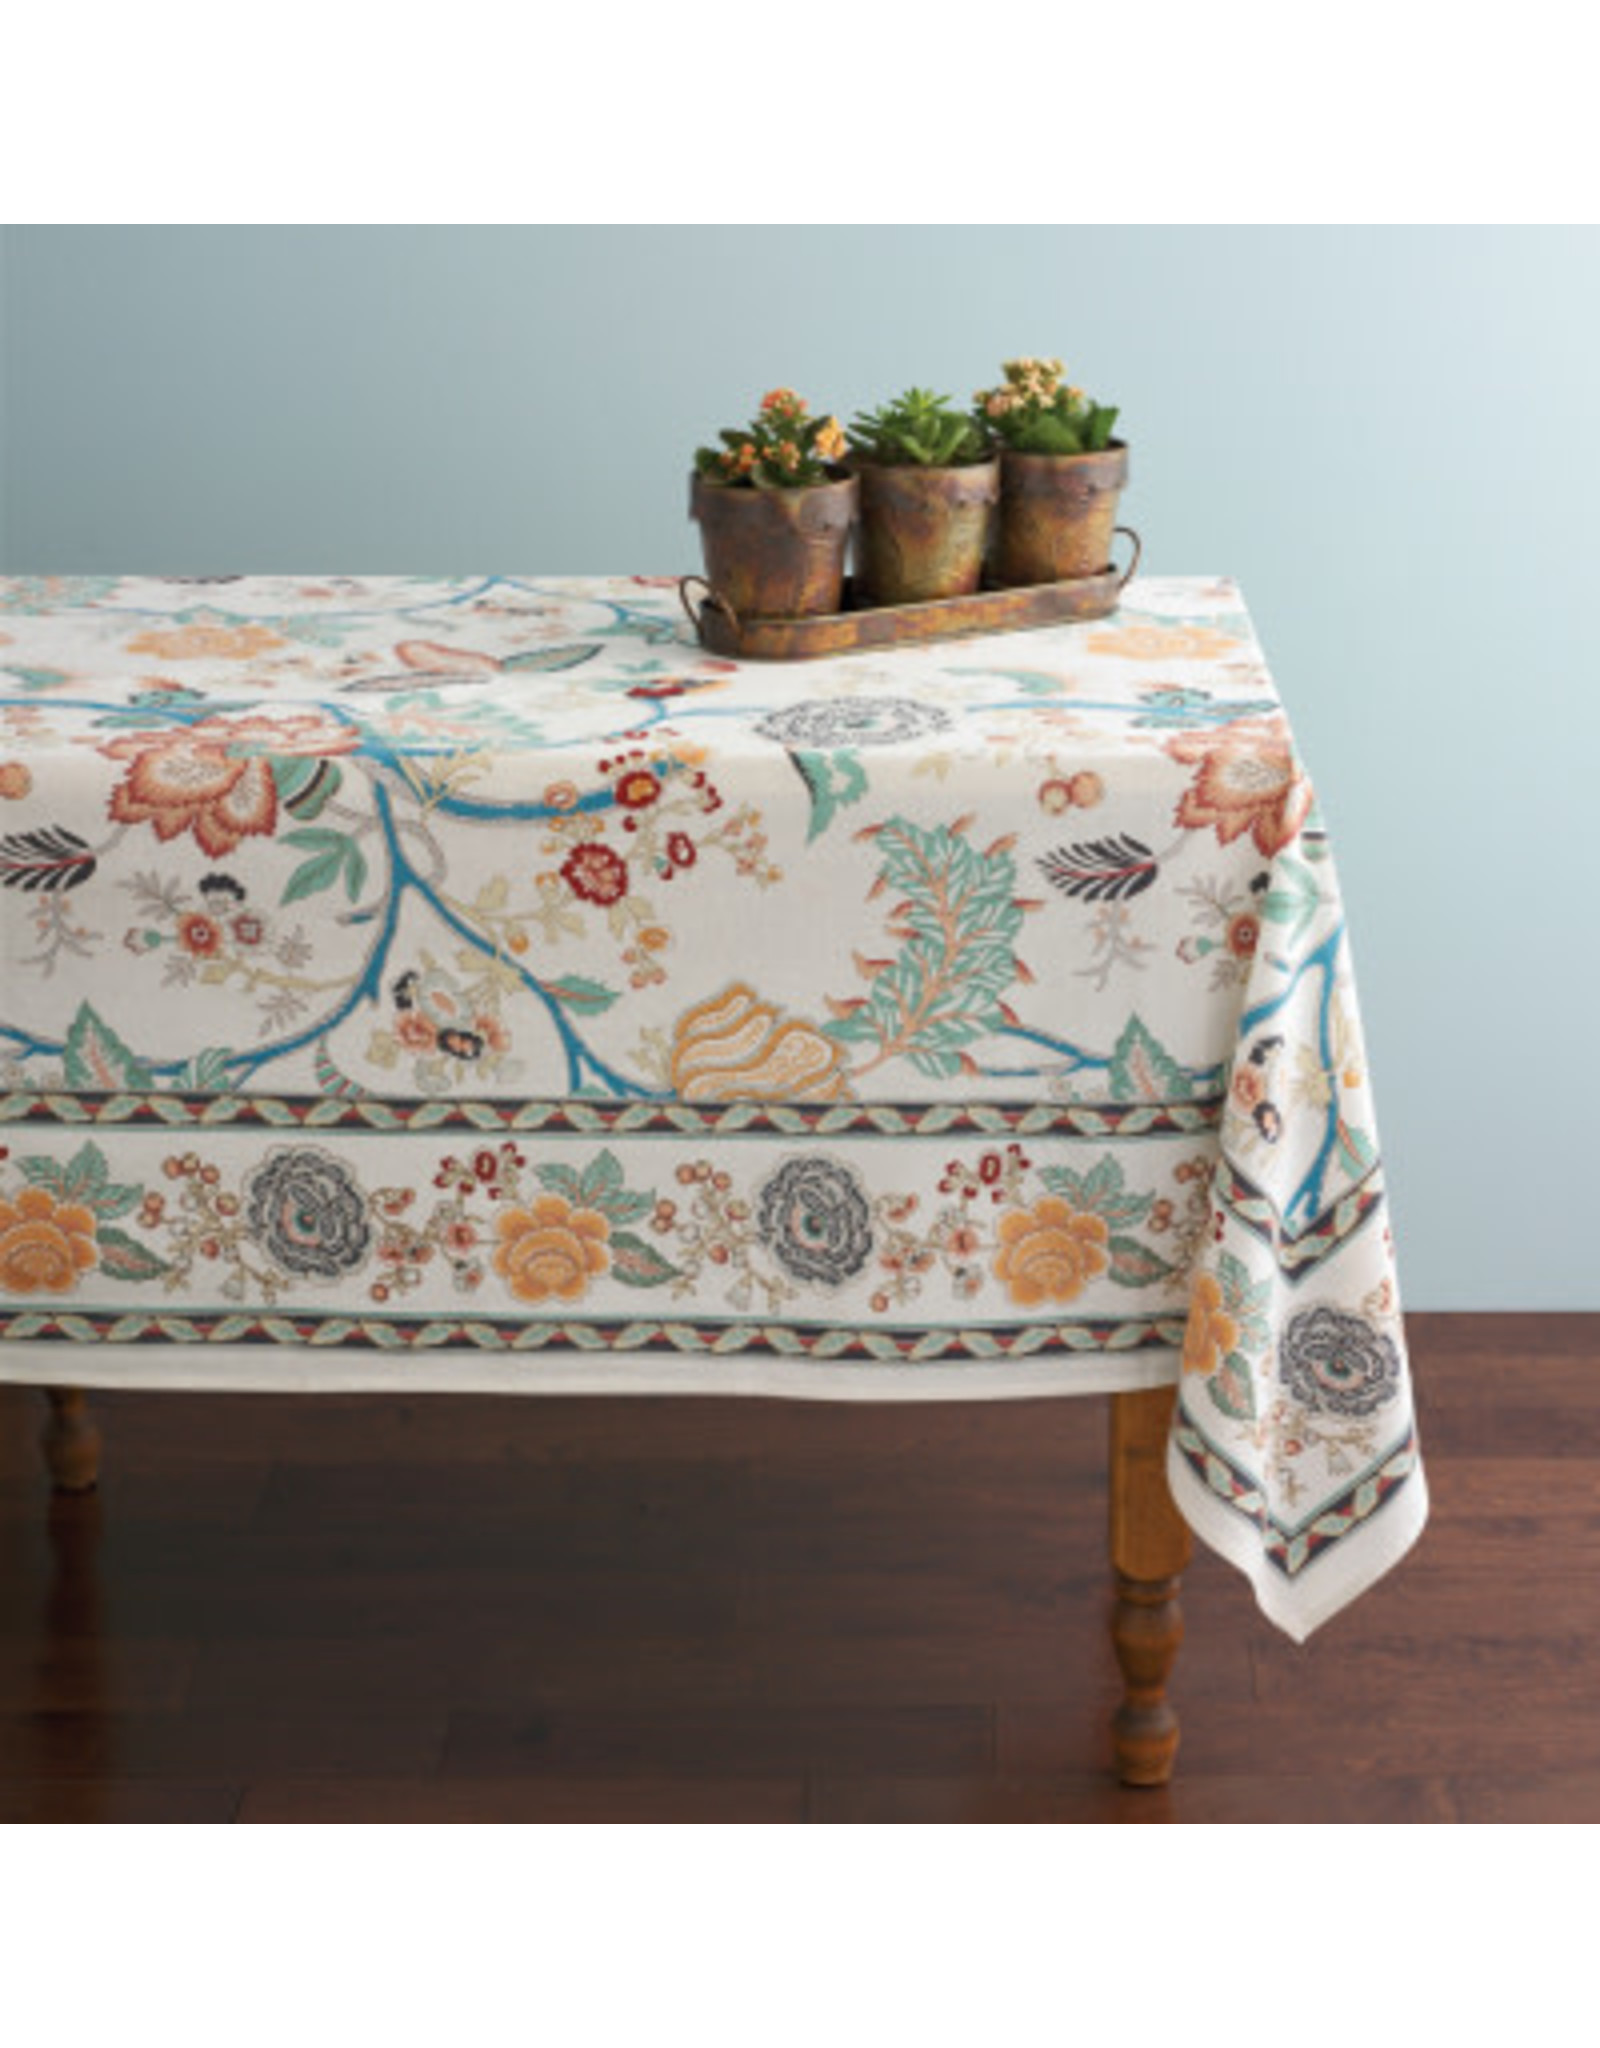 Modern Jaipur Tablecloth 60 x 90, India